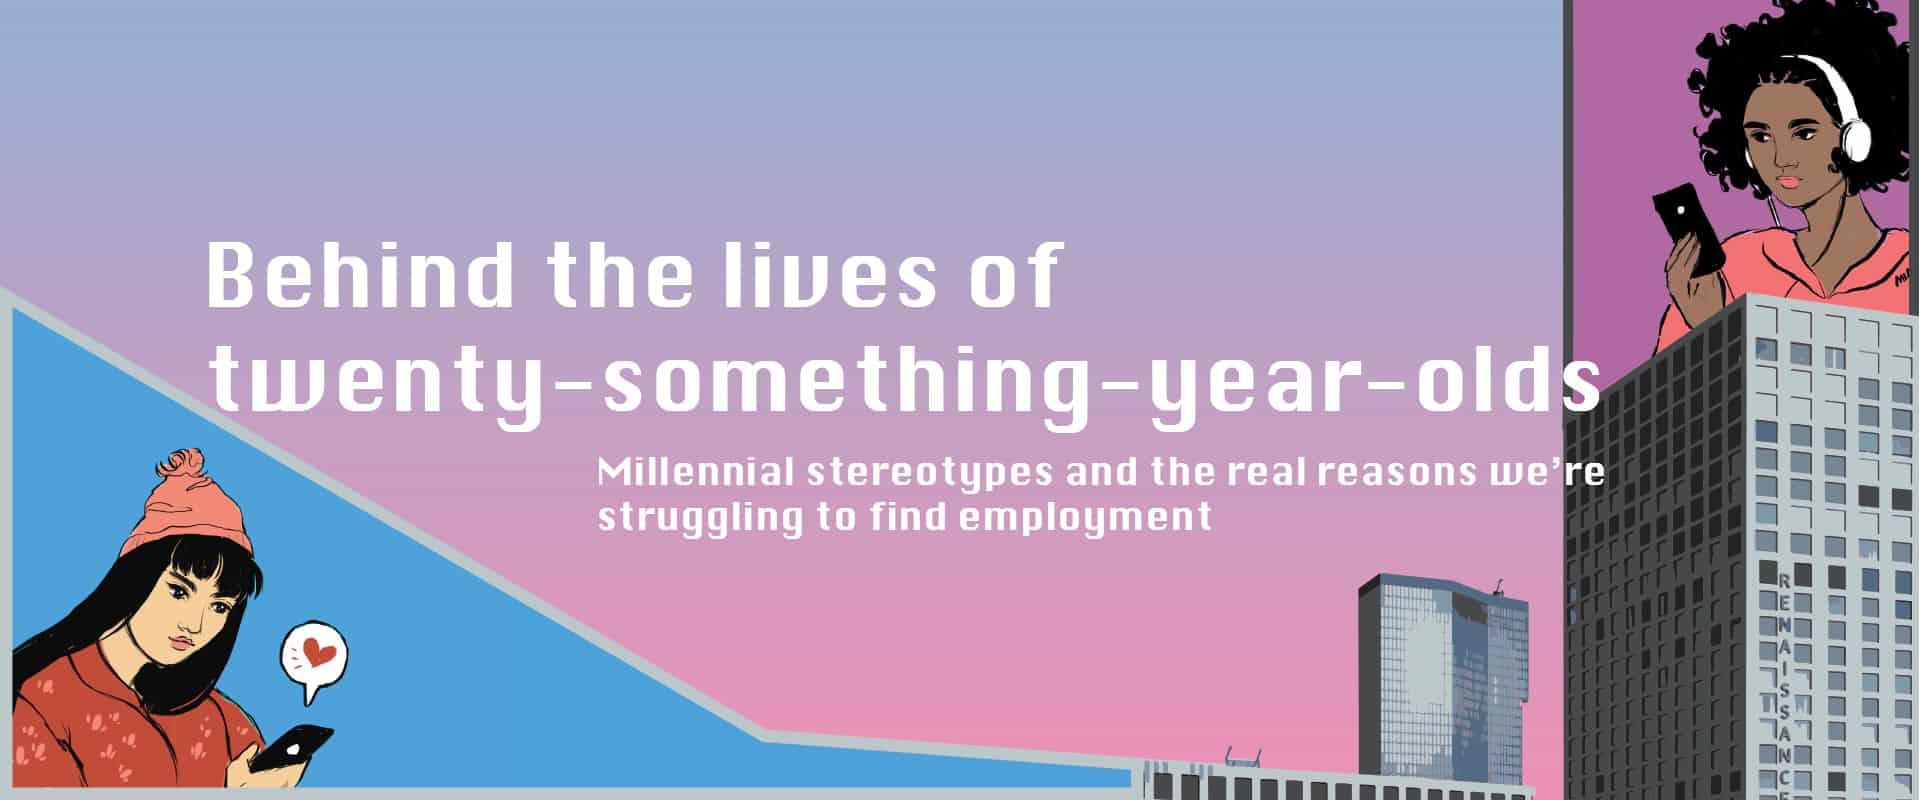 Behind the lives of twenty-something-year-olds